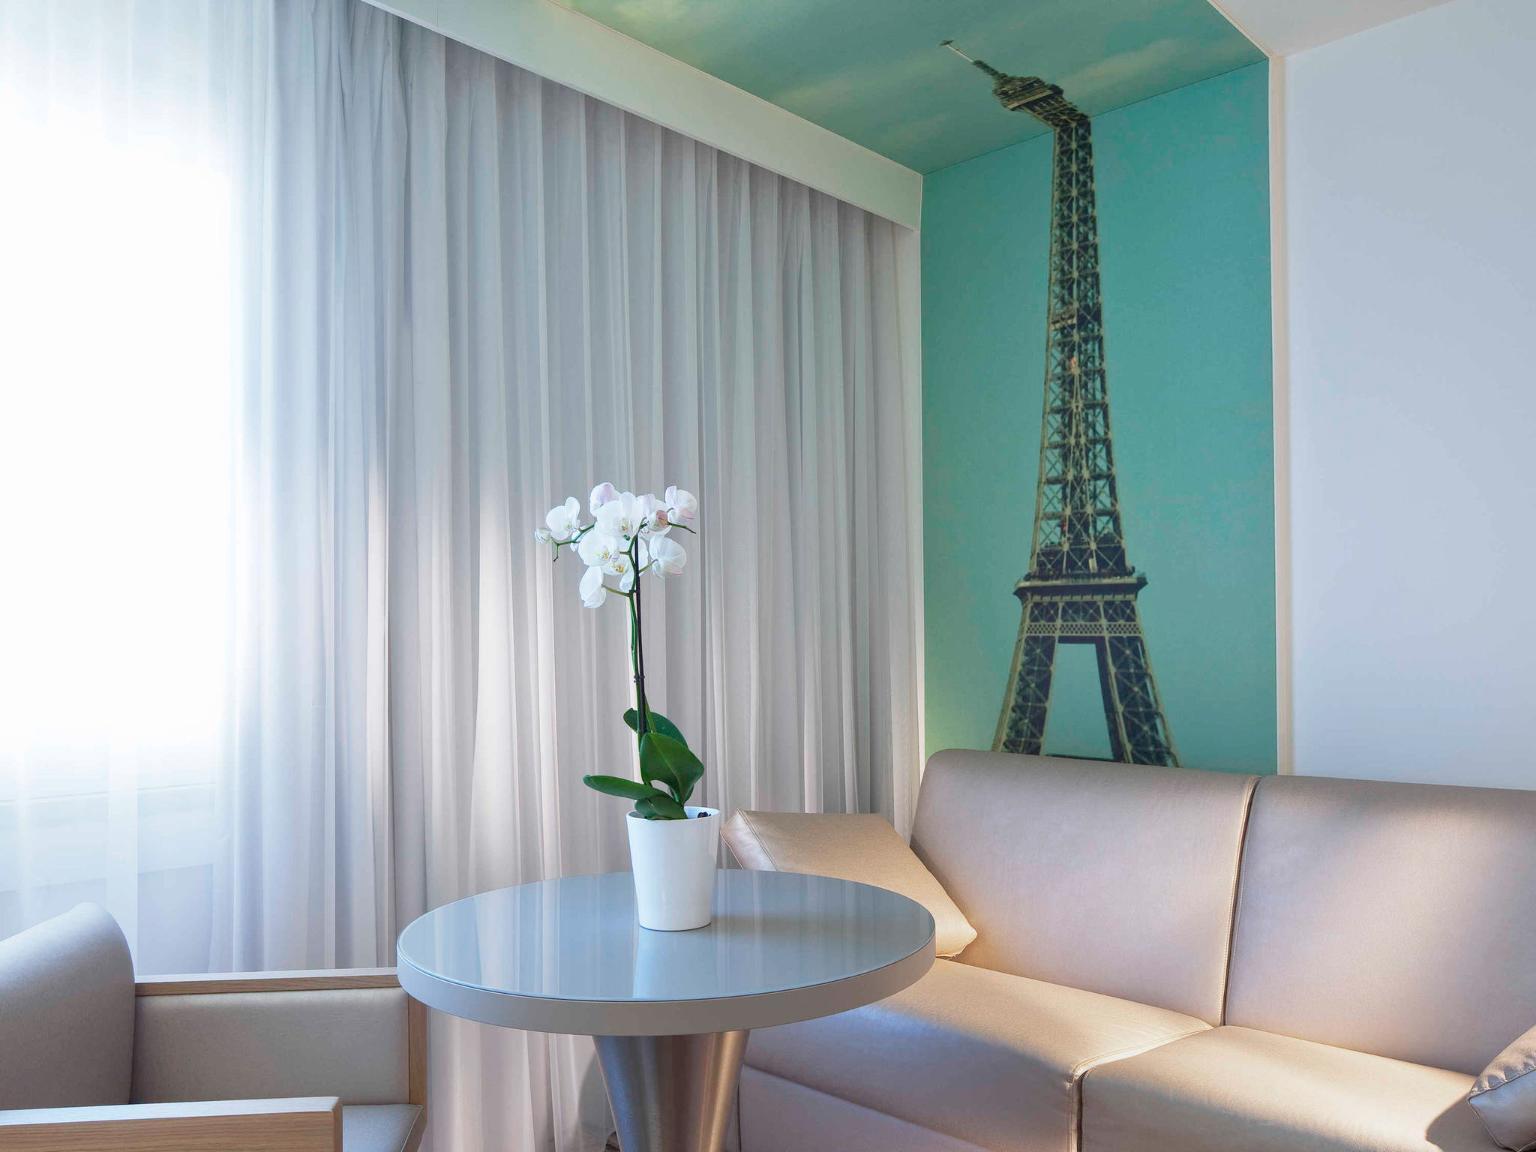 H tel mercure paris vaugirard porte de versailles h tel 69 boulevard victor 75015 paris - Adresse porte de versailles ...